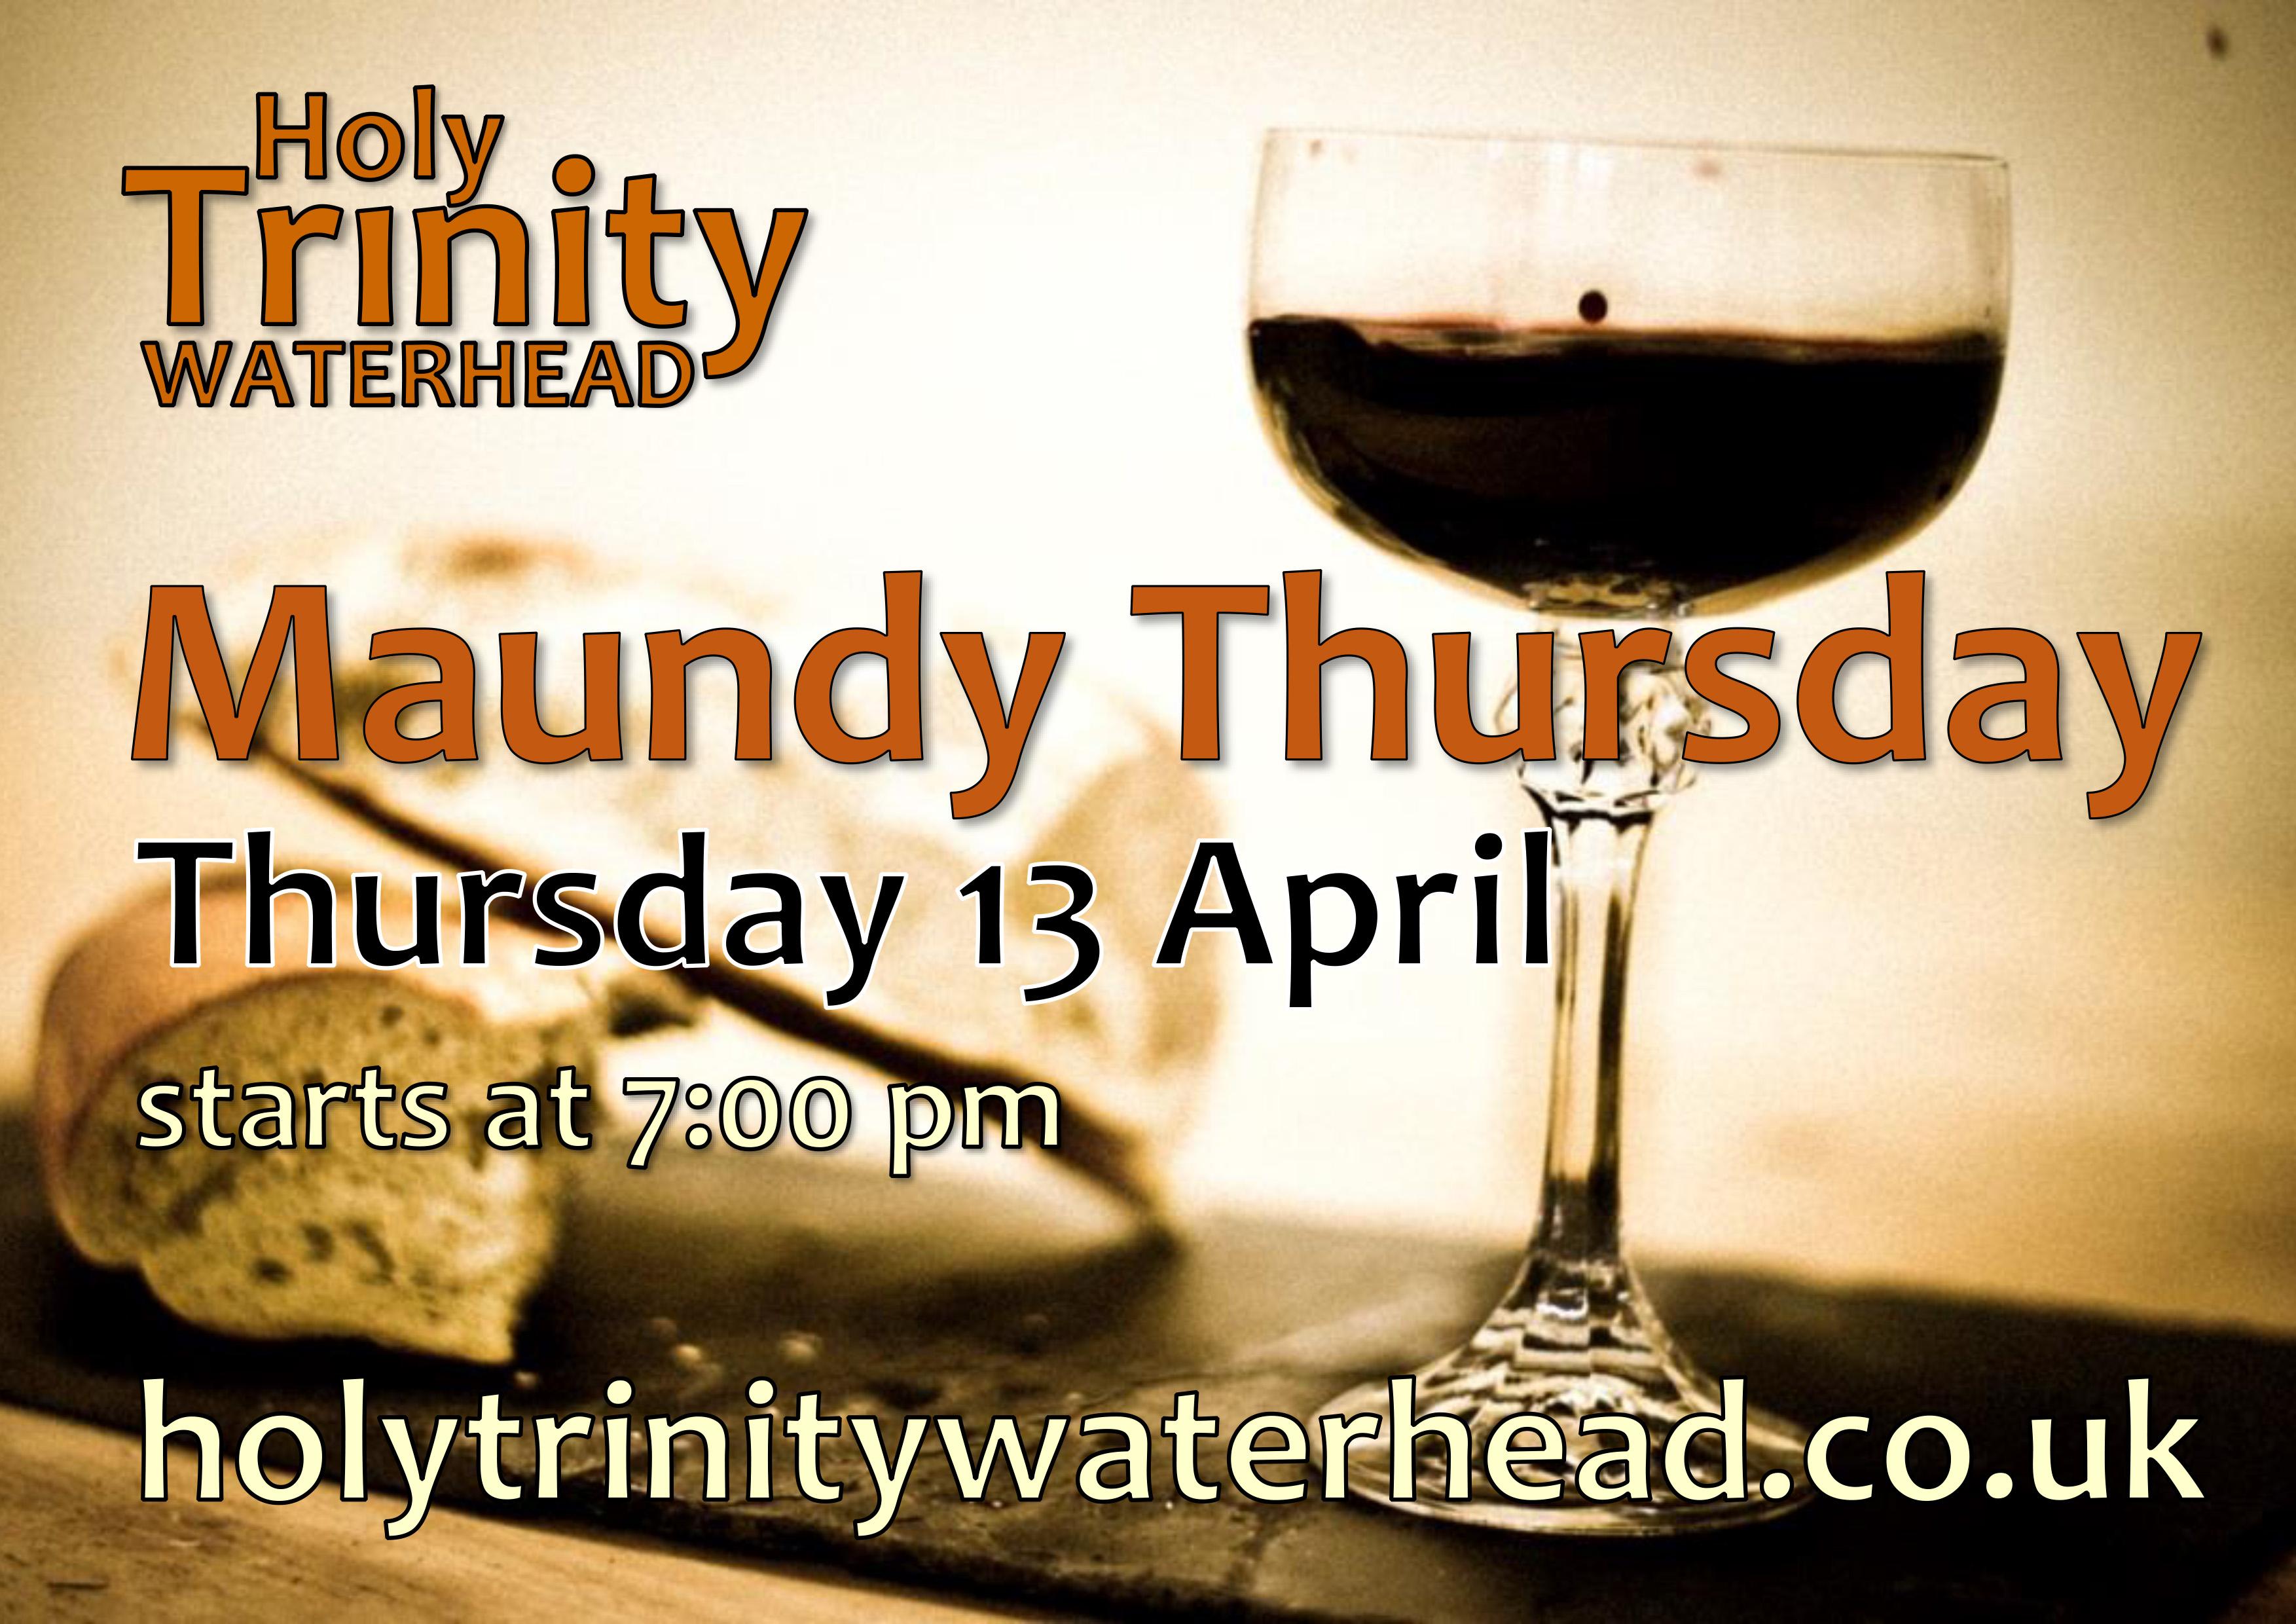 maundy thursday - photo #27